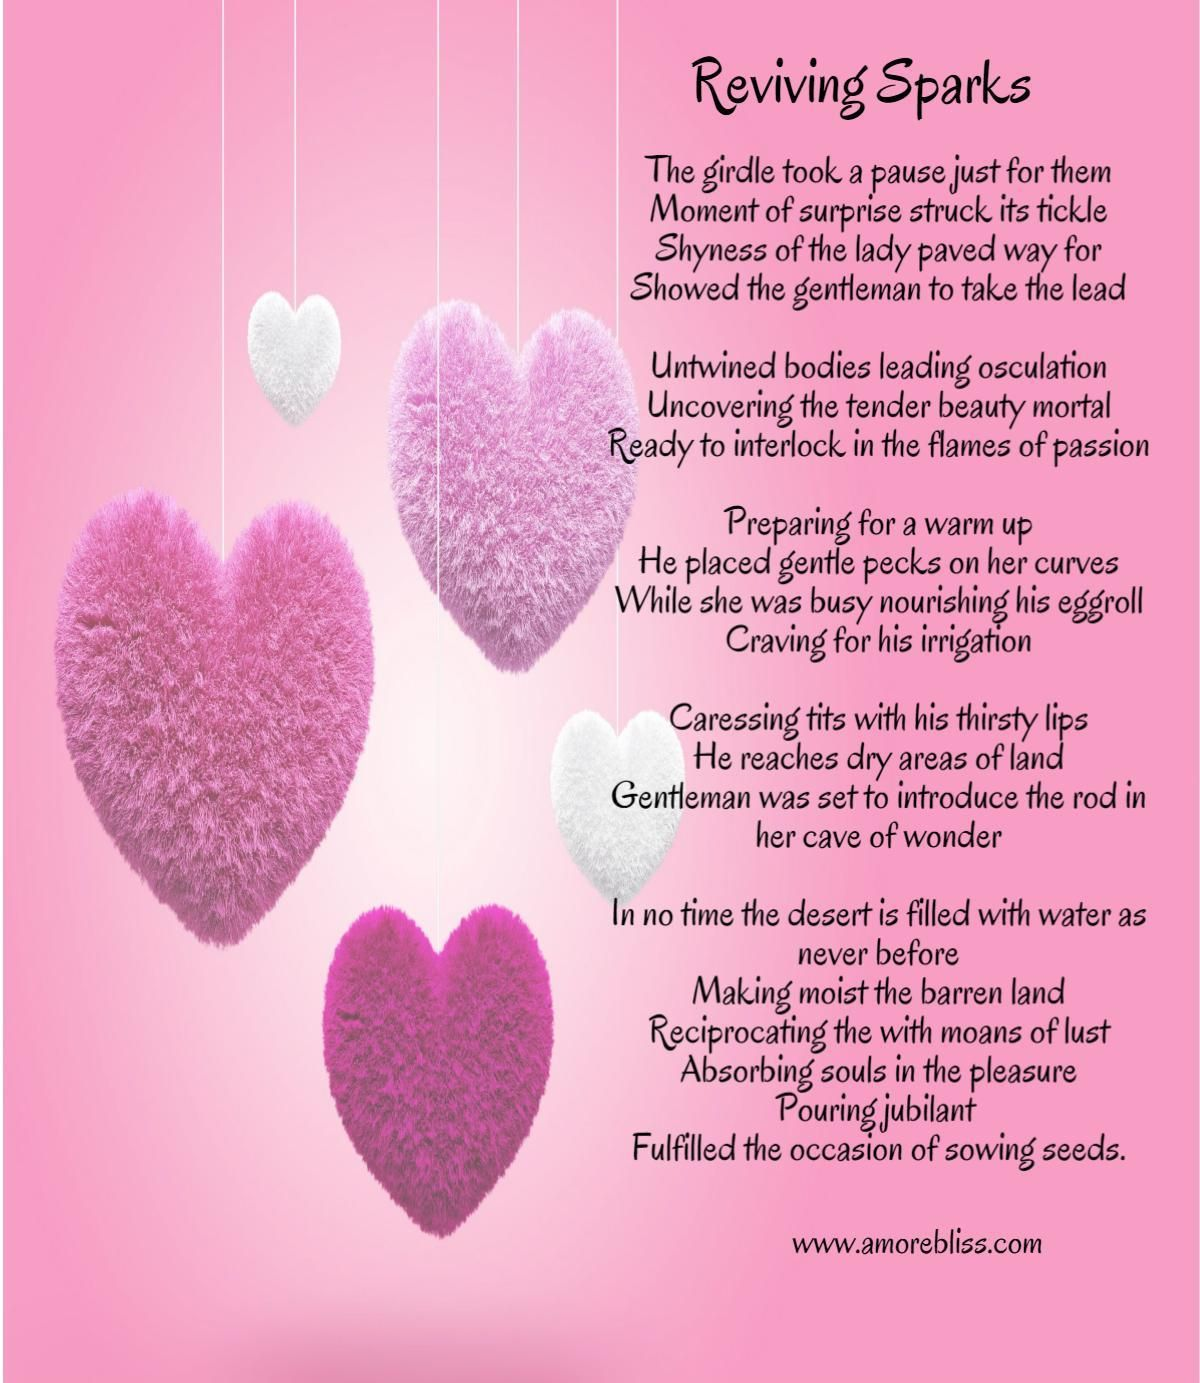 Rekindling lost love